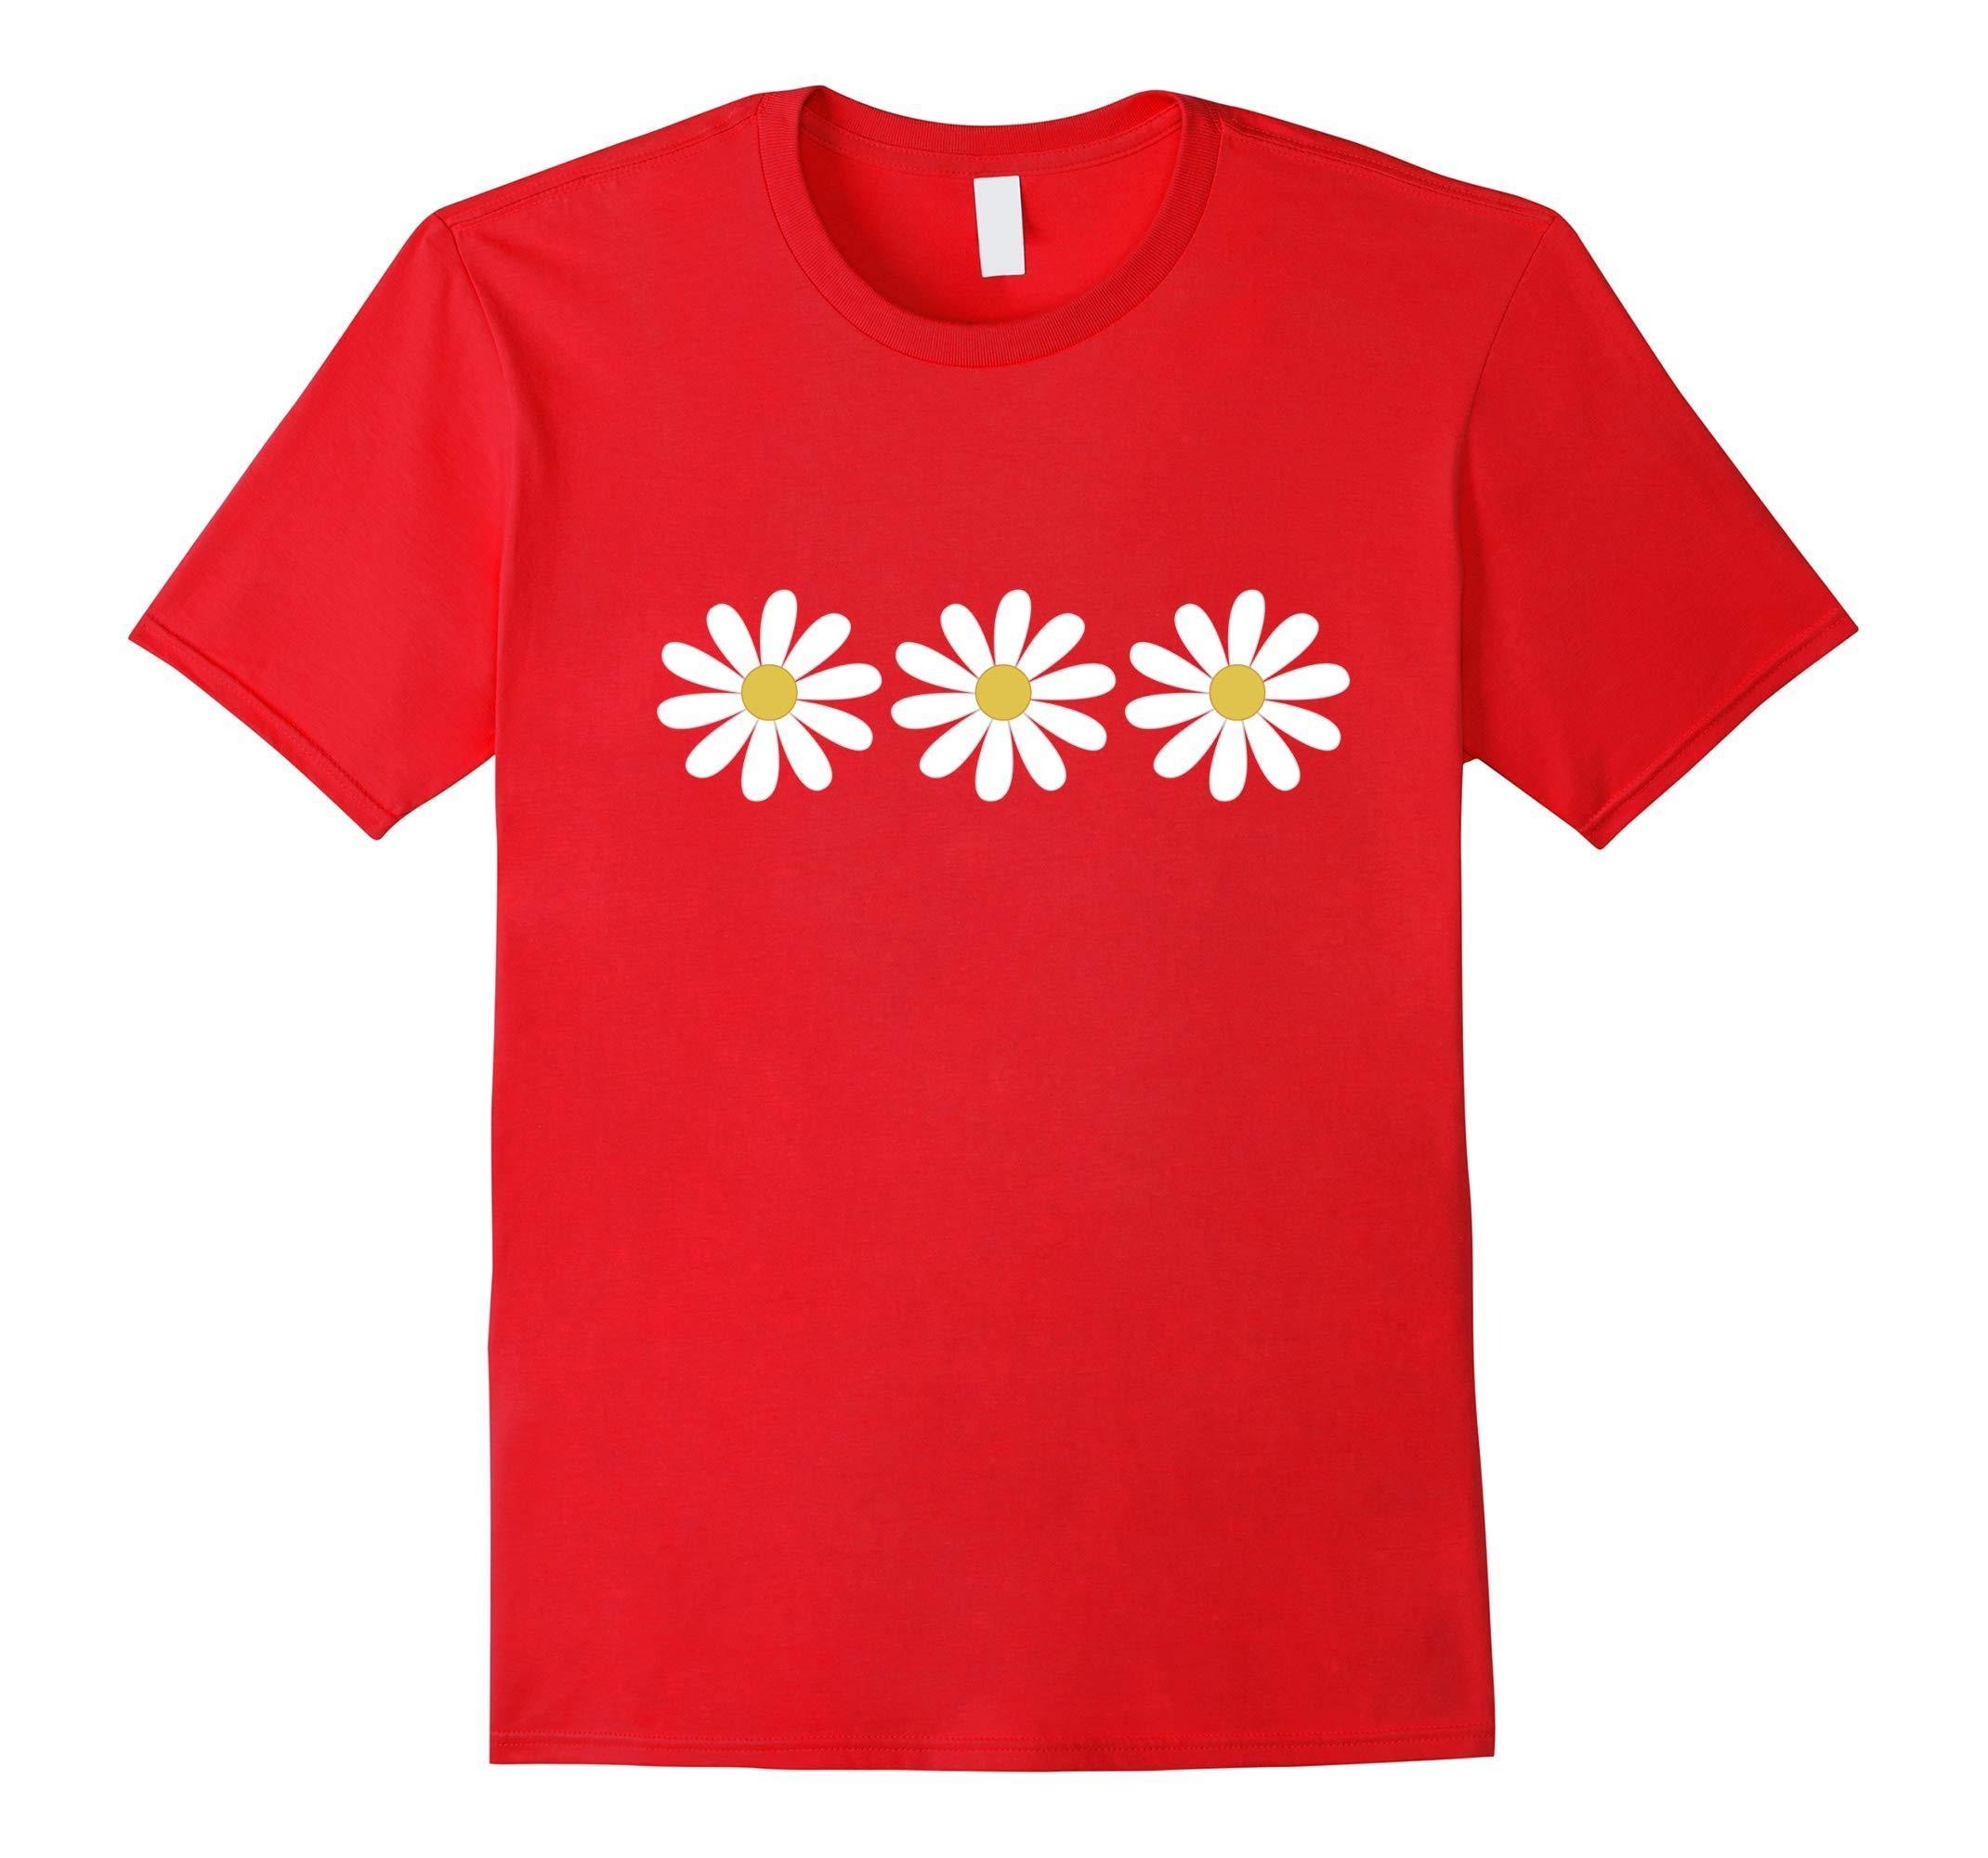 3 Simple But Pretty Daisy Flower T Shirt